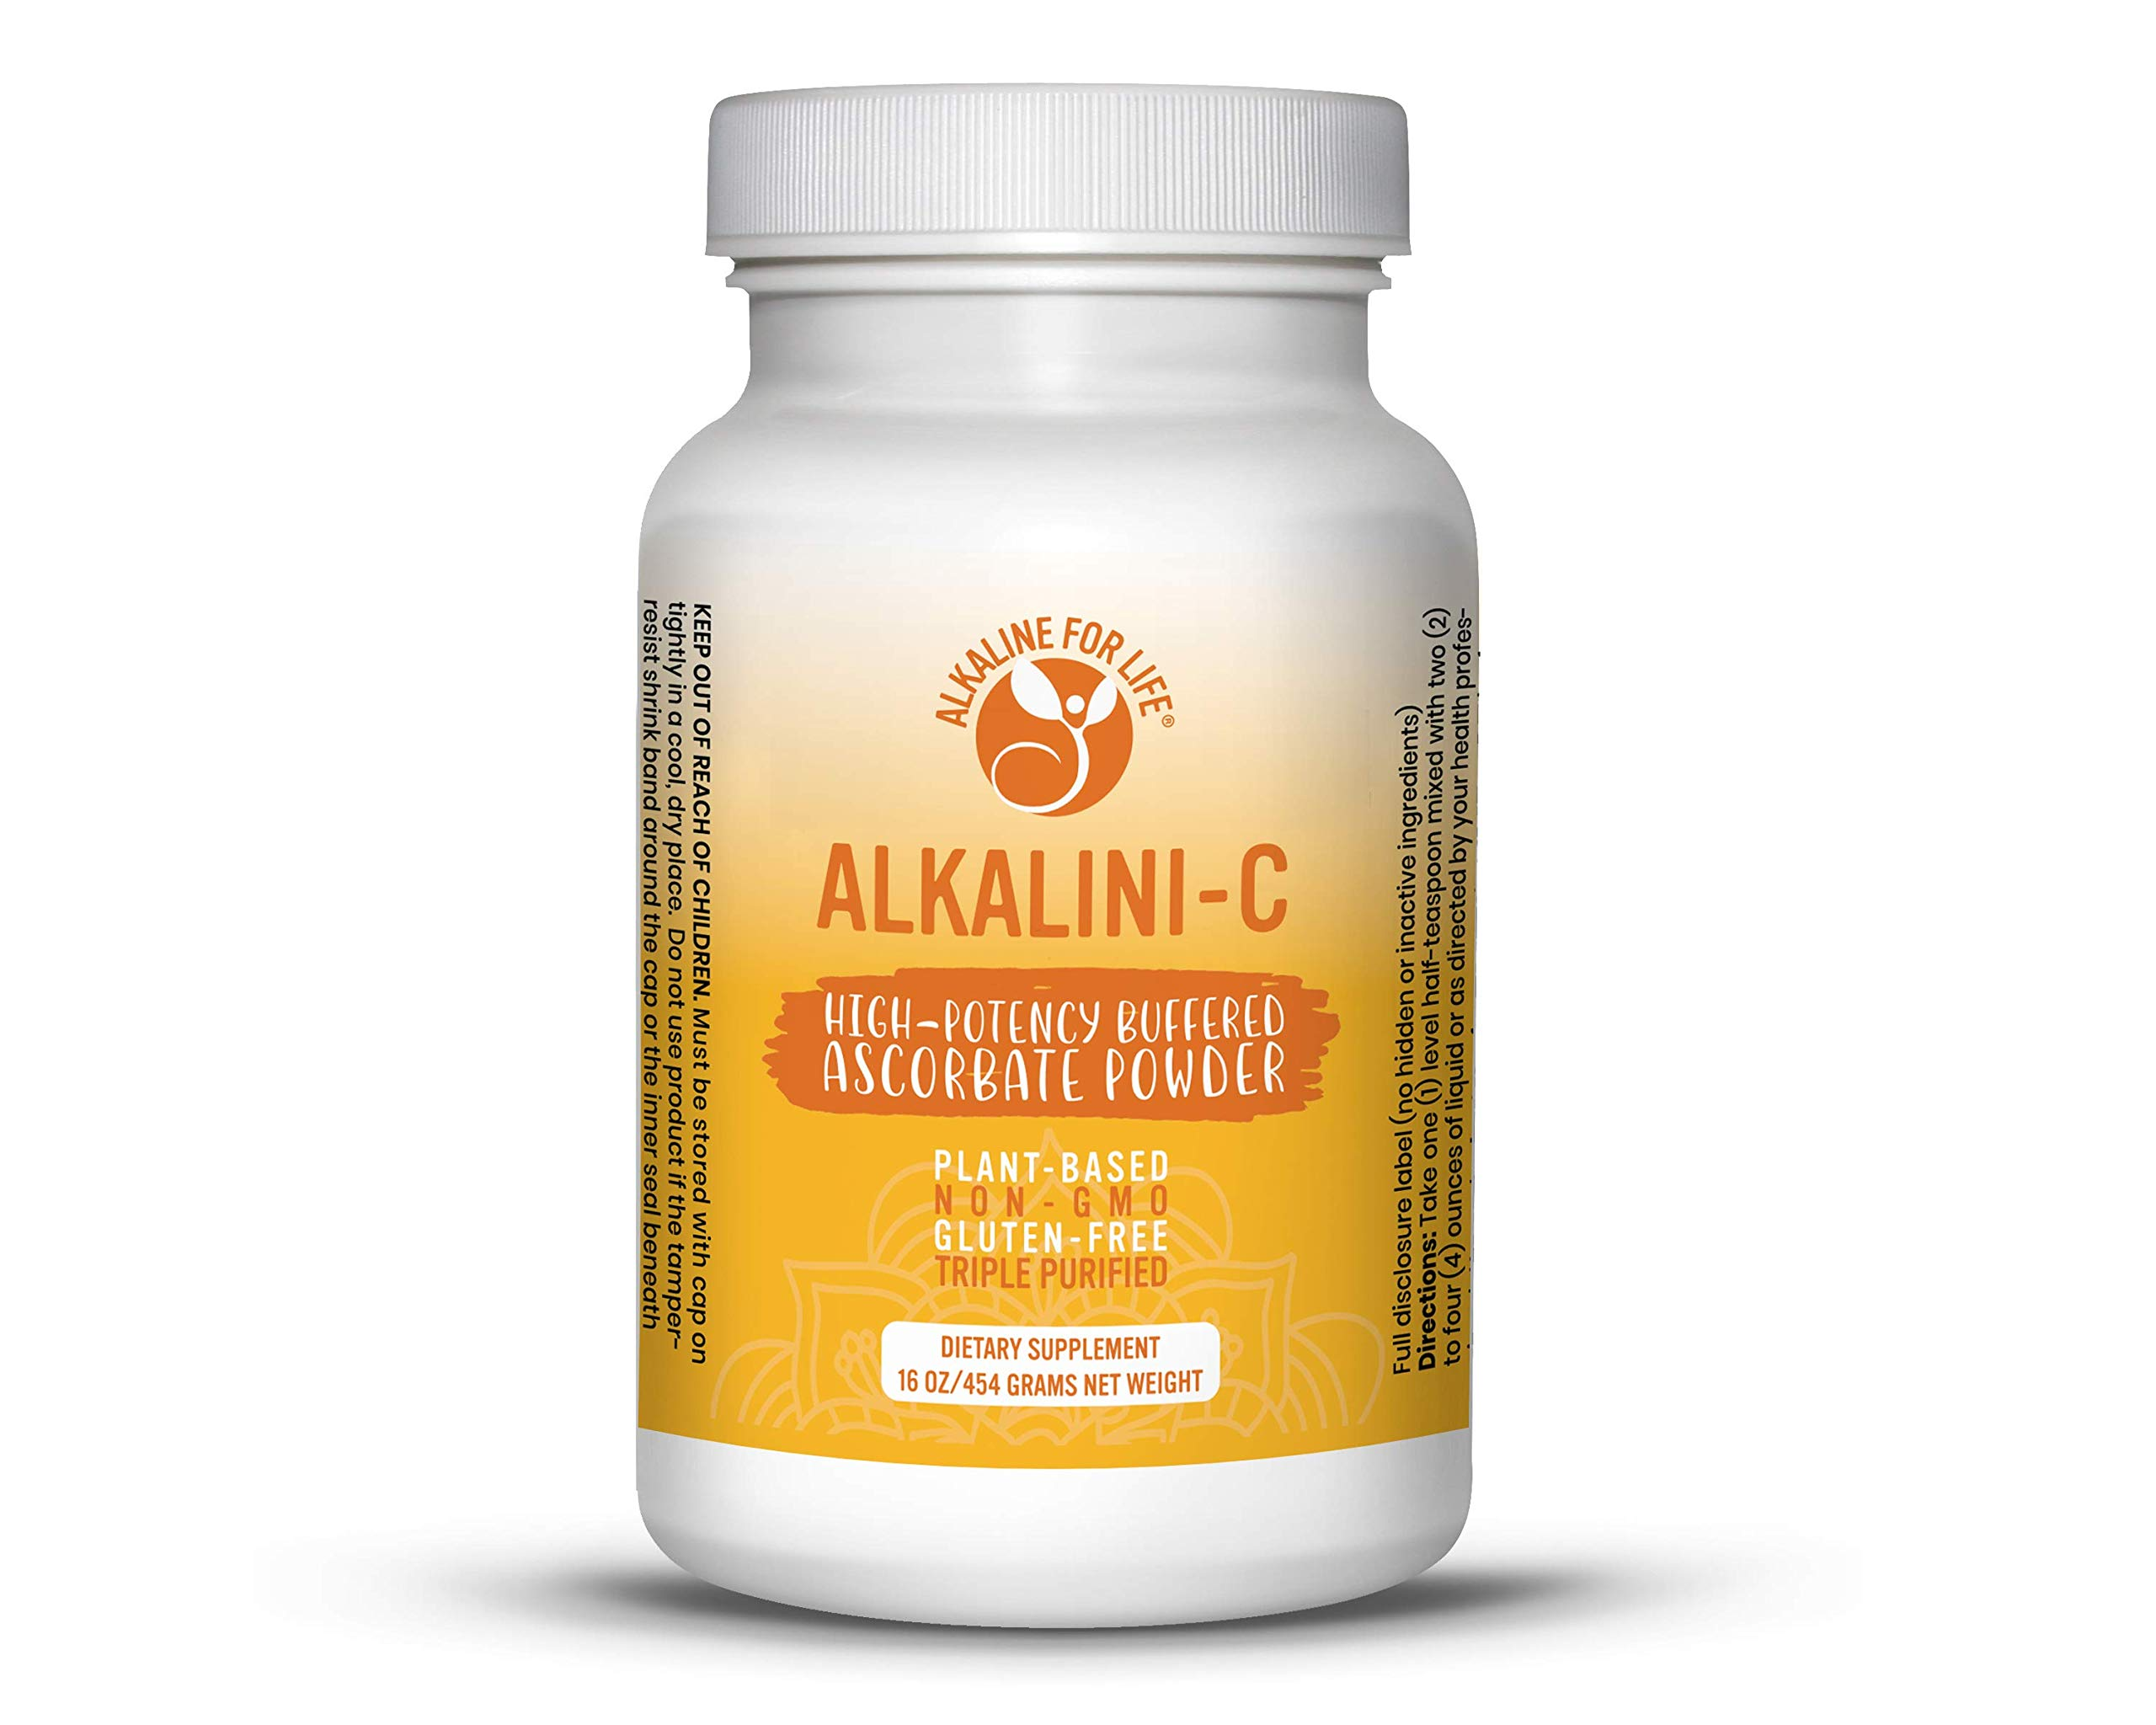 Alkalini-C (16oz)